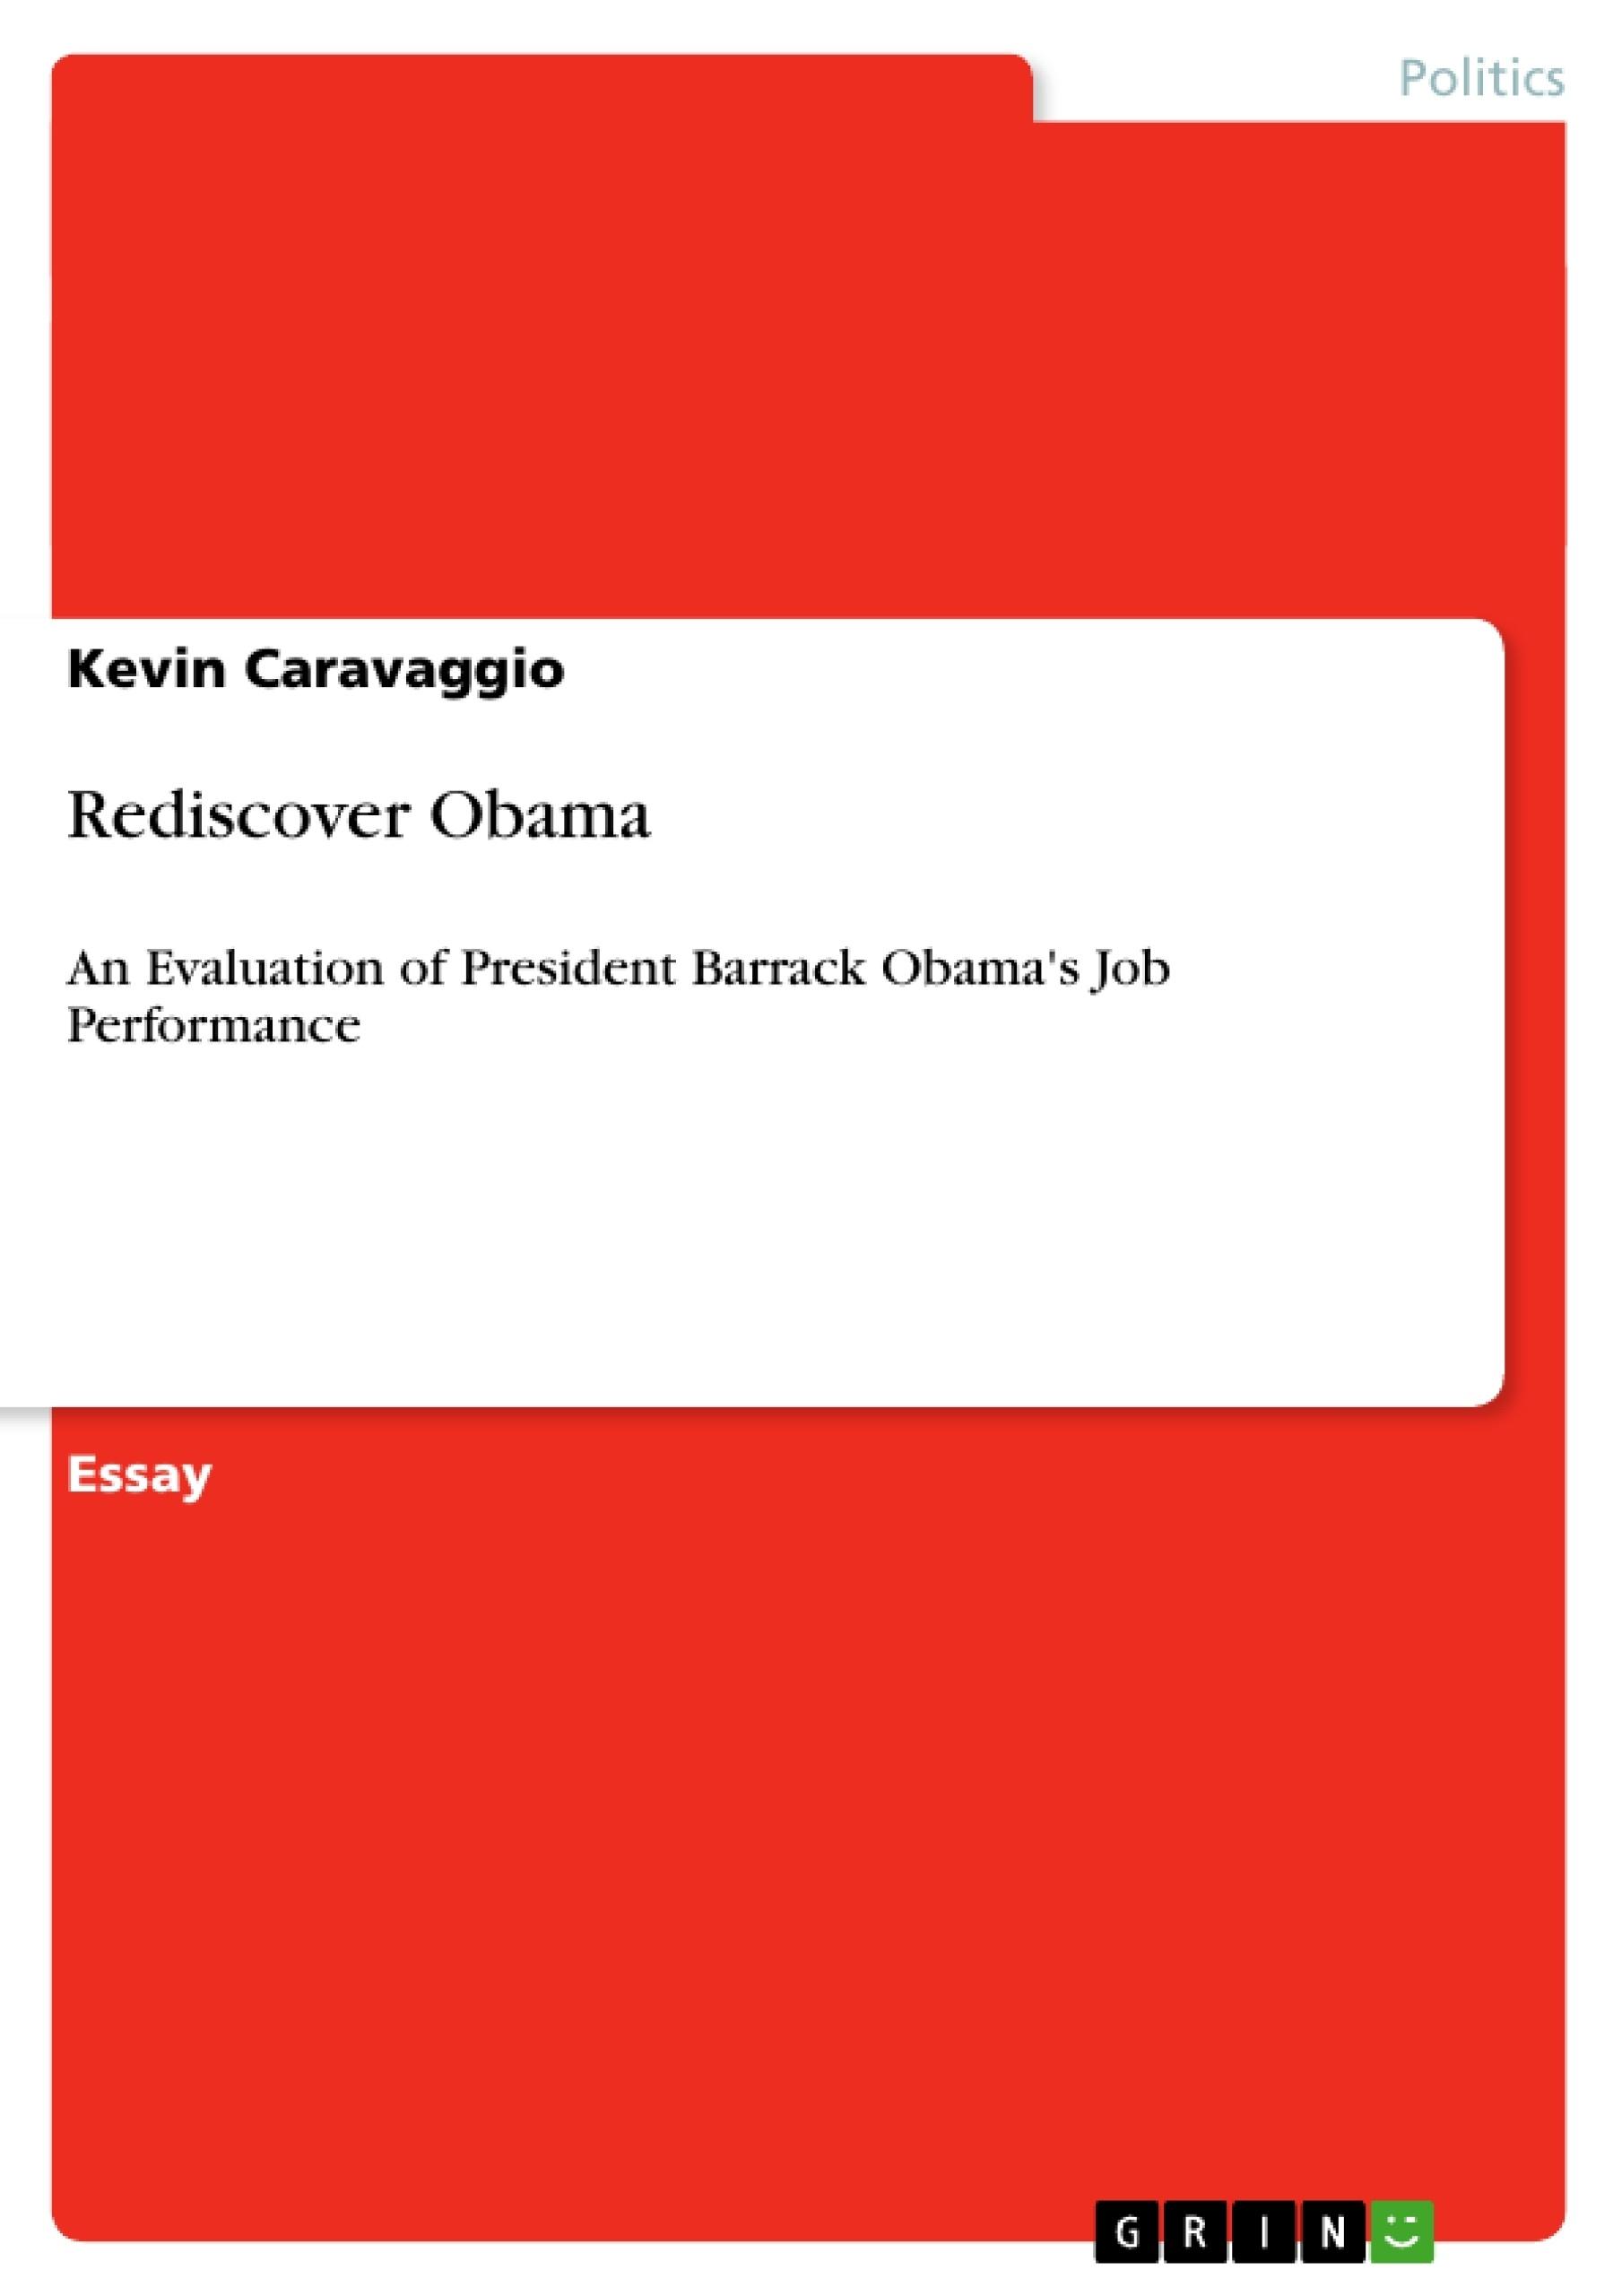 Title: Rediscover Obama